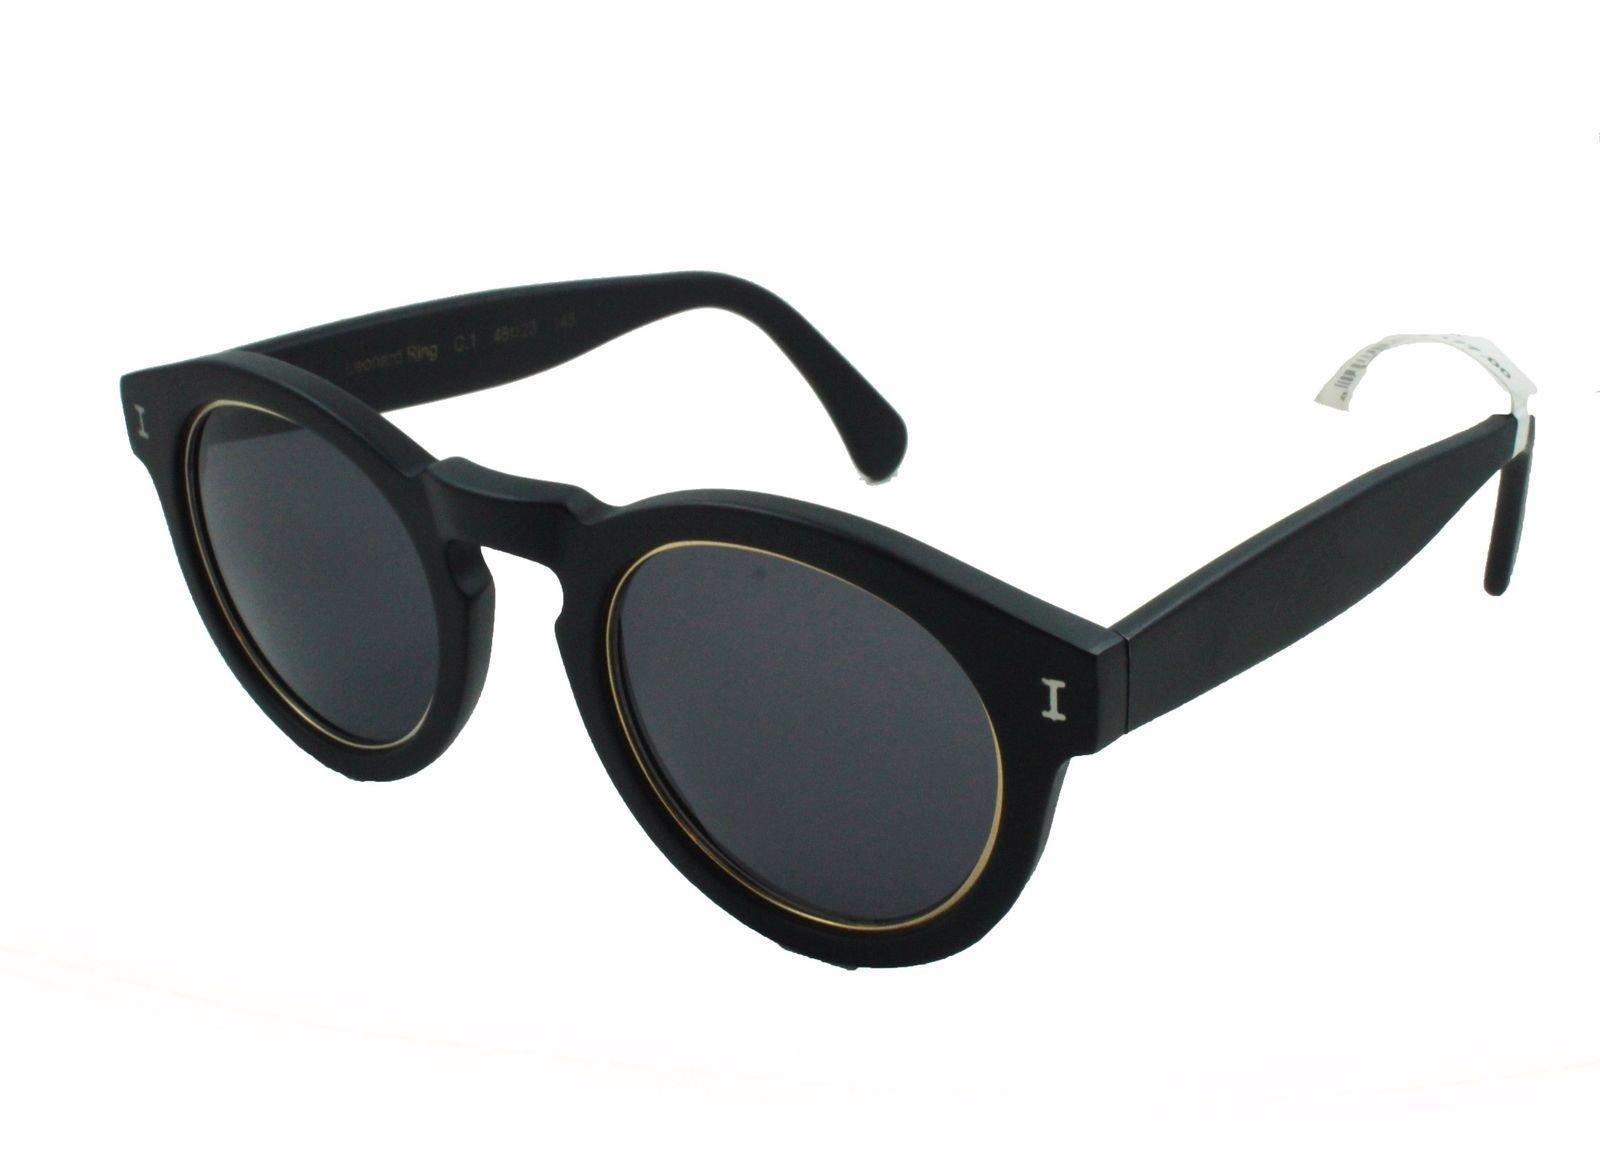 b090be47a65 Illesteva Leonard Ring C.1 Sunglasses Black Matte Keyhole Round Gray Solid  Lens